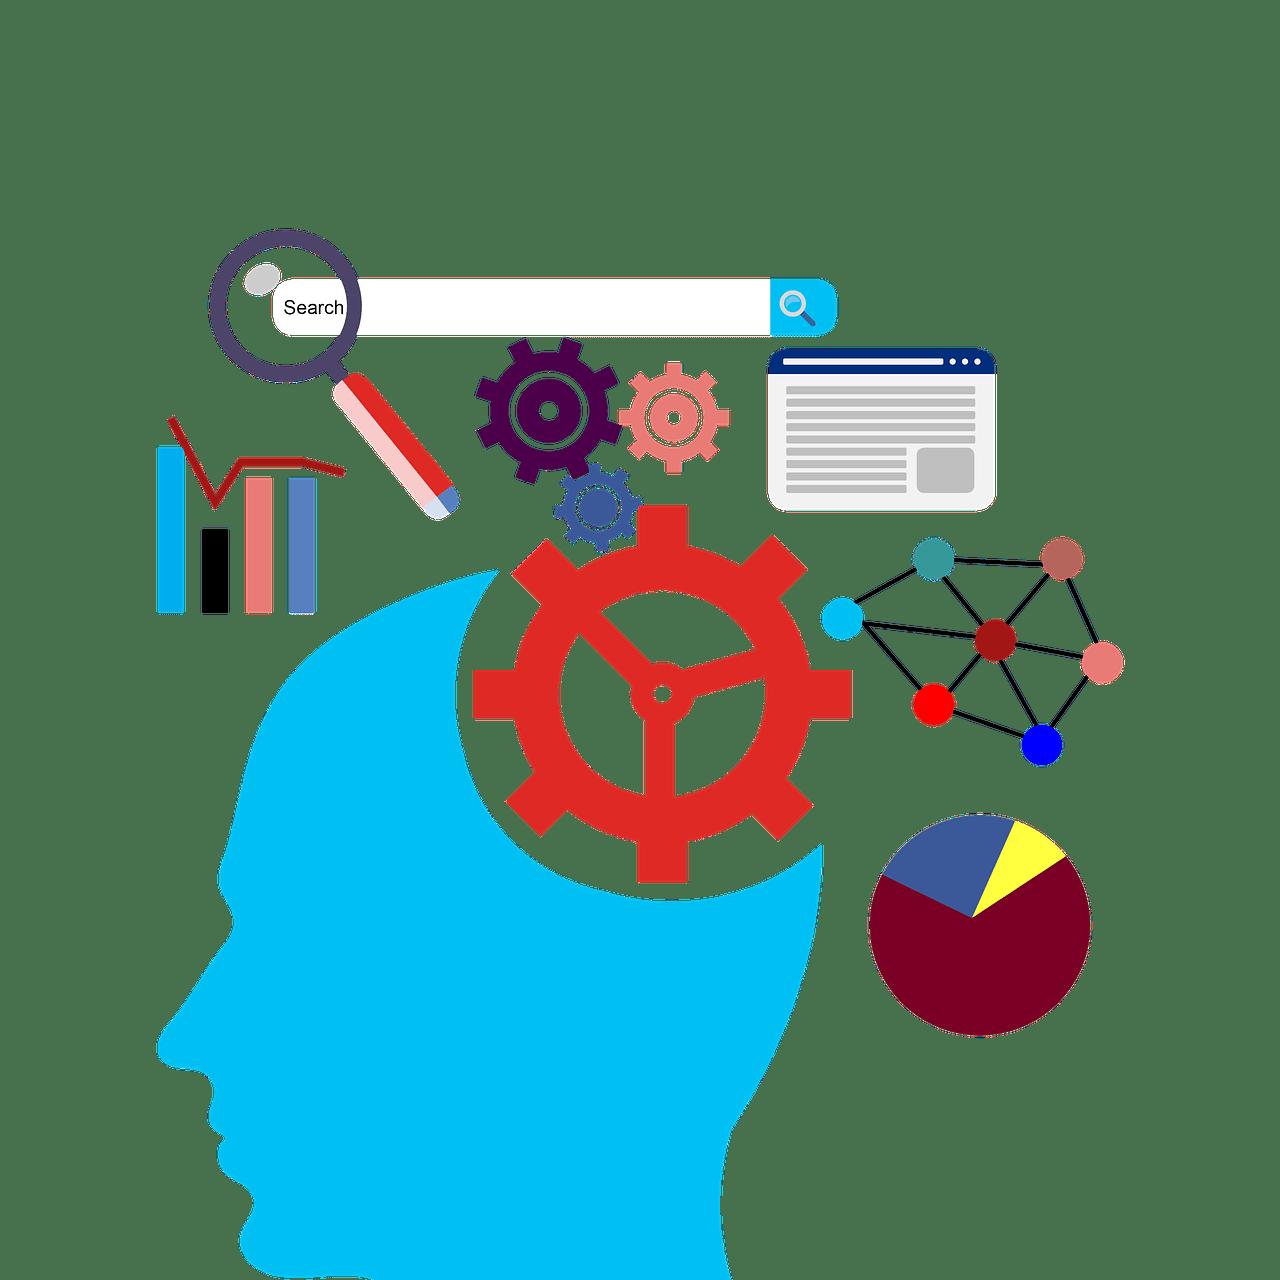 digital marketing, search engine optimization, search engines